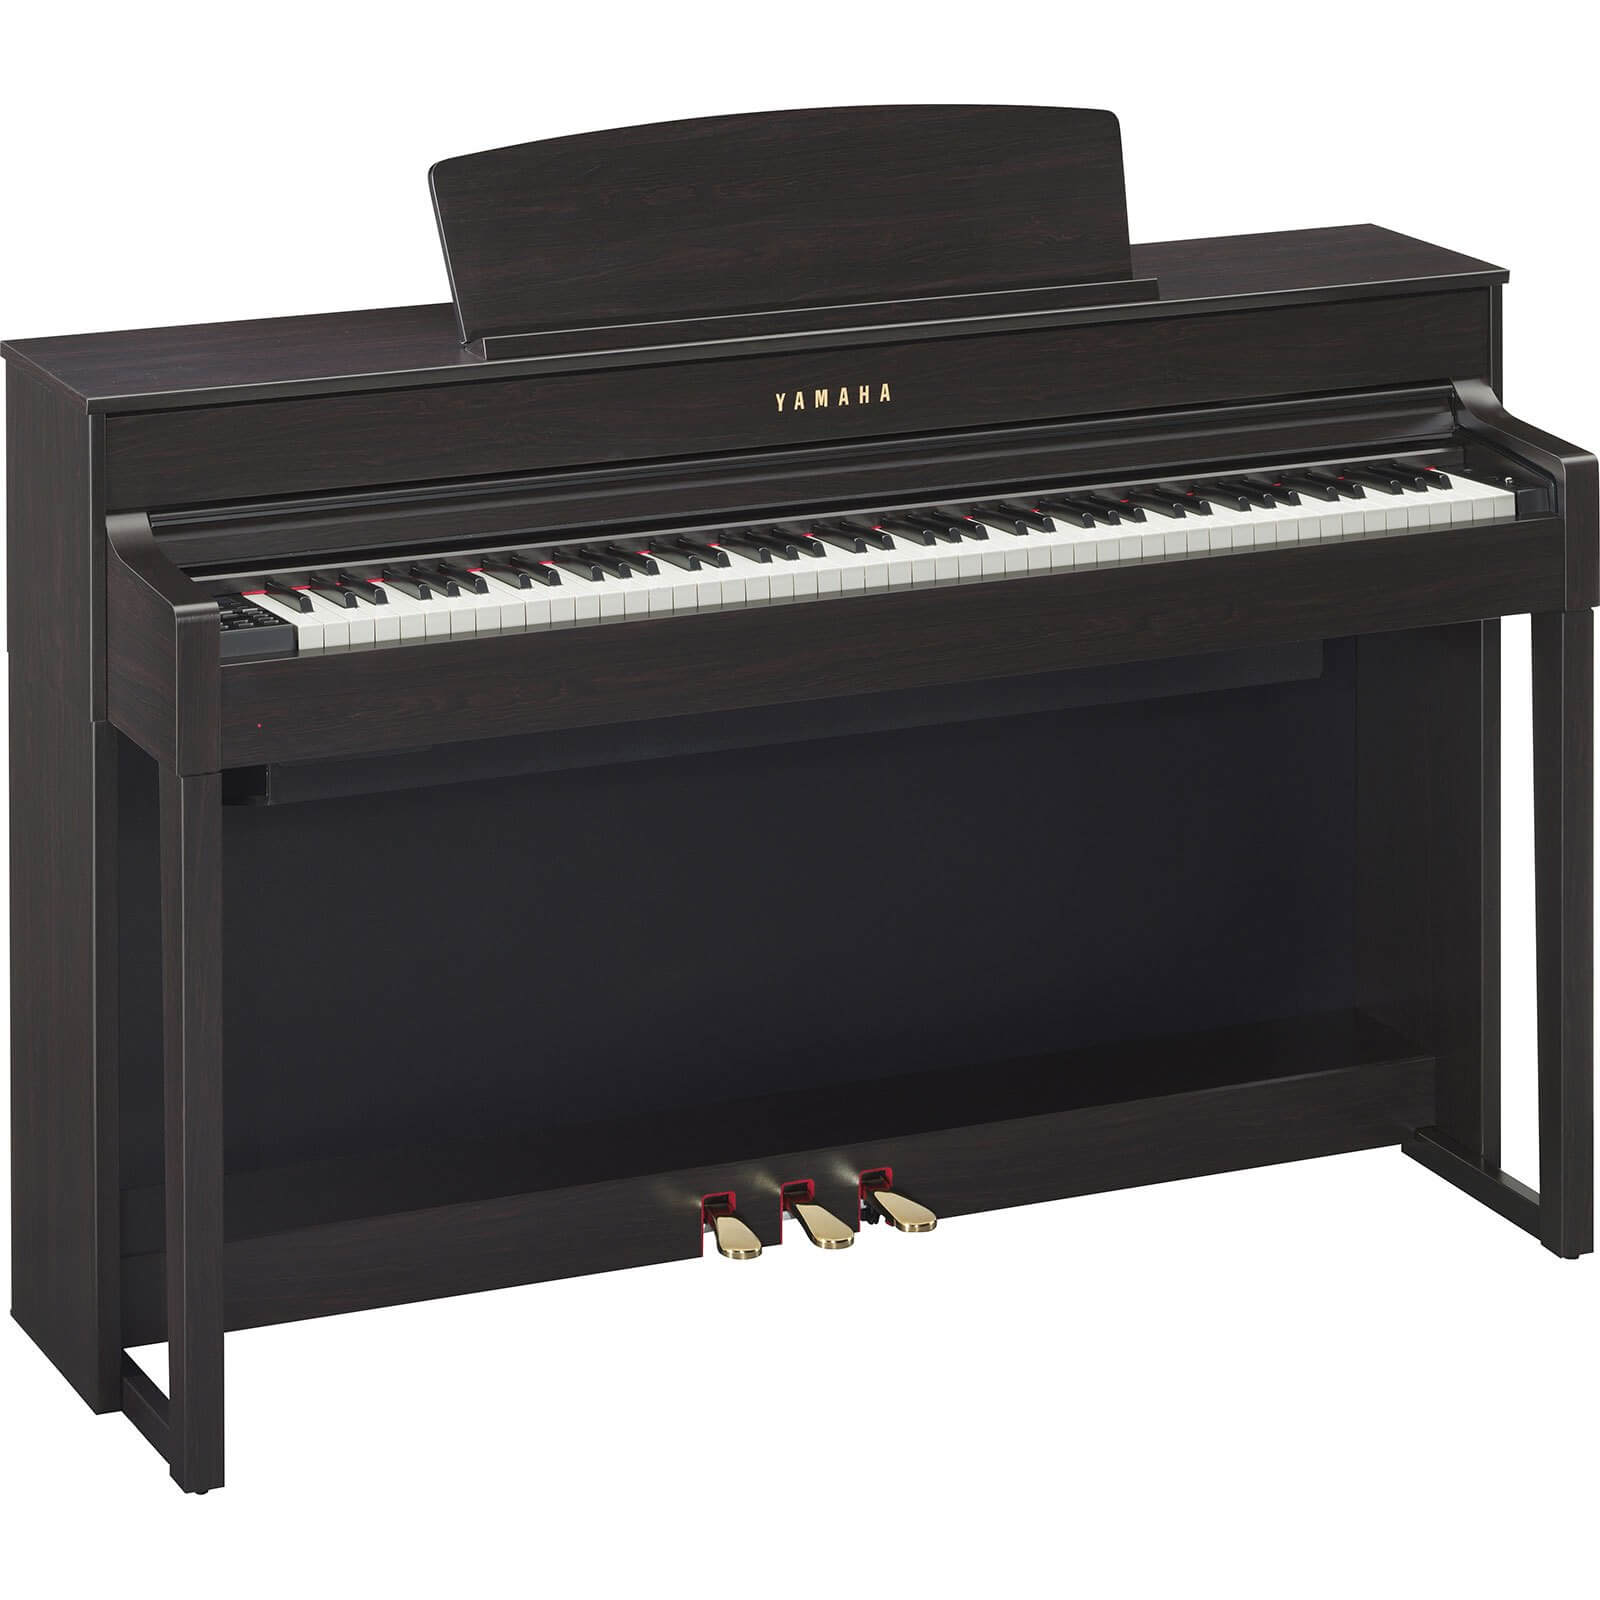 Piano Digital Yamaha CLP-575R Palisandro Mate